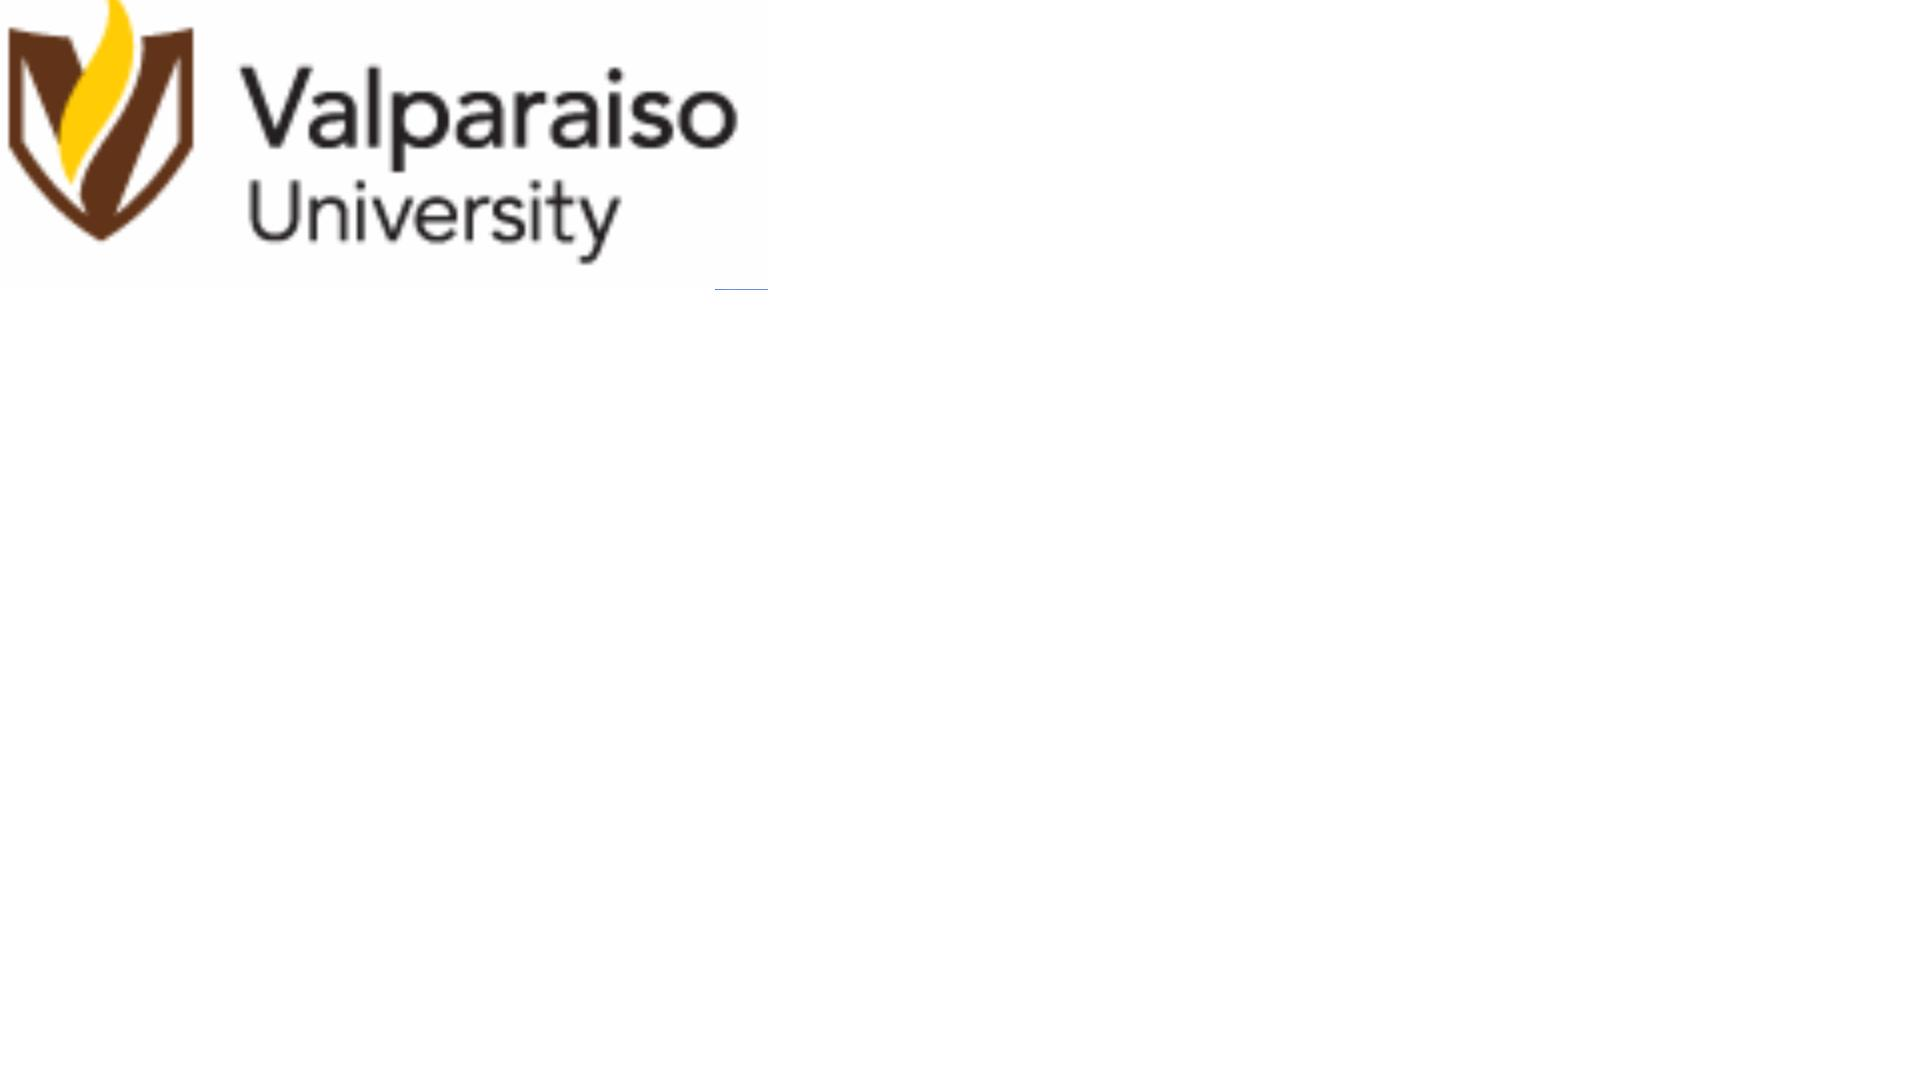 Valparaiso University Graduate Studies & Cont Ed